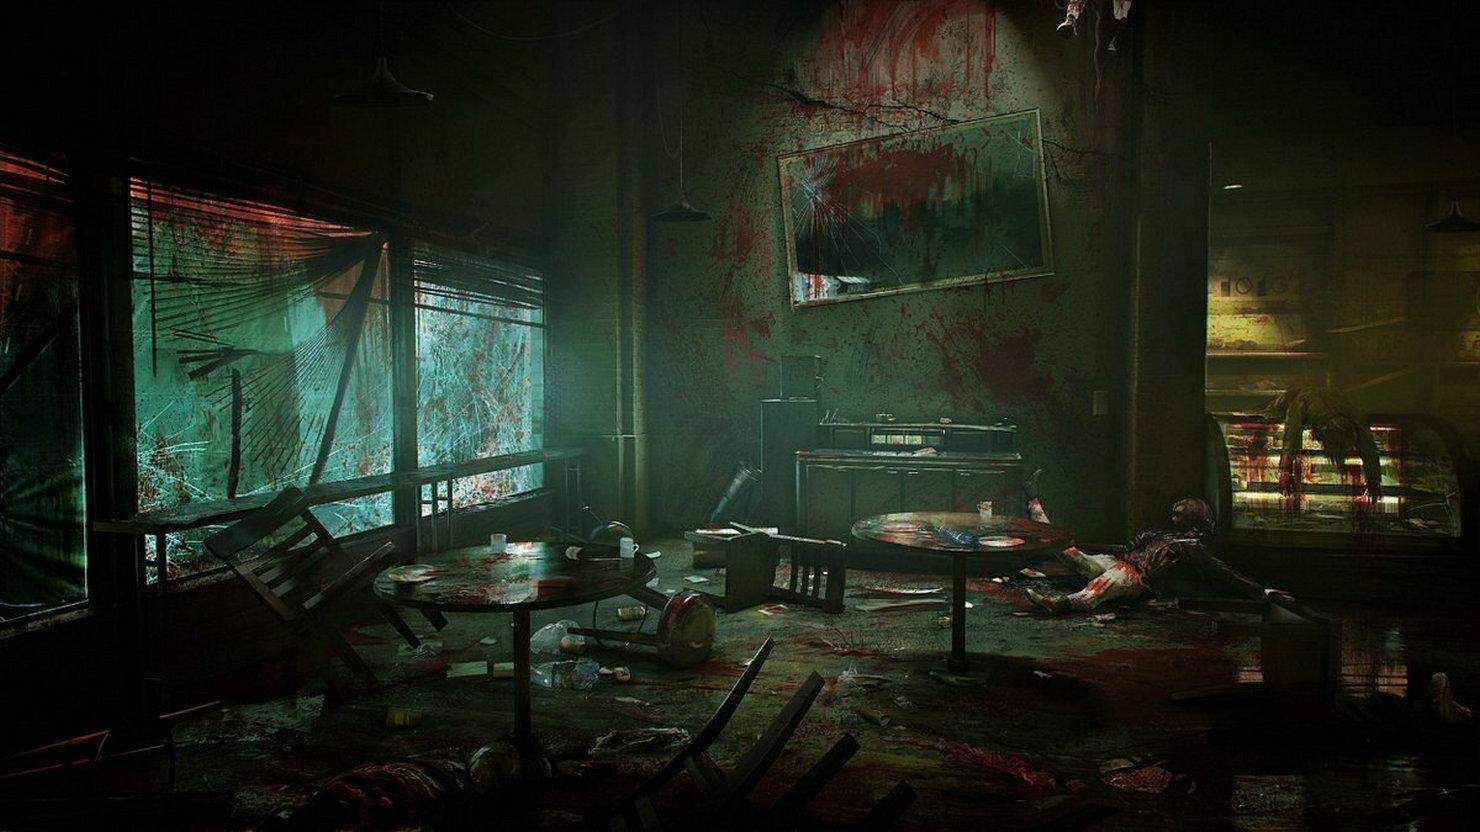 Анонс Vampire: The Masquerade от Paradox Interactive состоится 21 марта